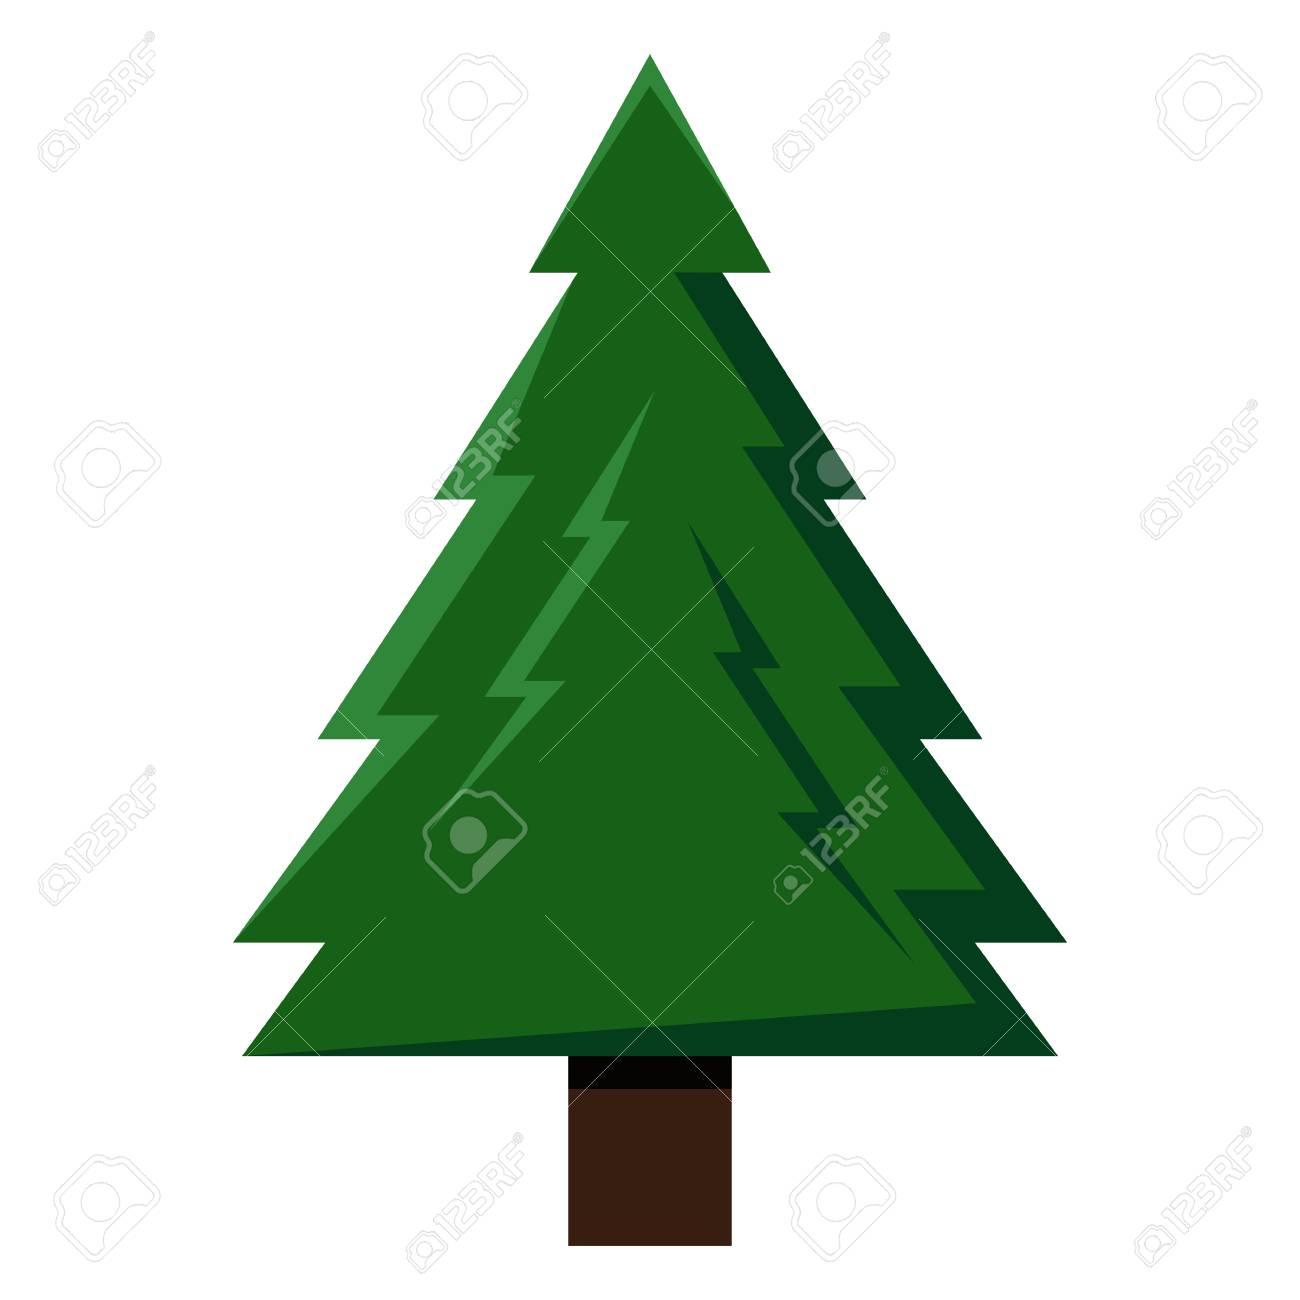 vector single color icon green pine tree royalty free cliparts rh 123rf com pine tree vector clip art pine tree vector logo